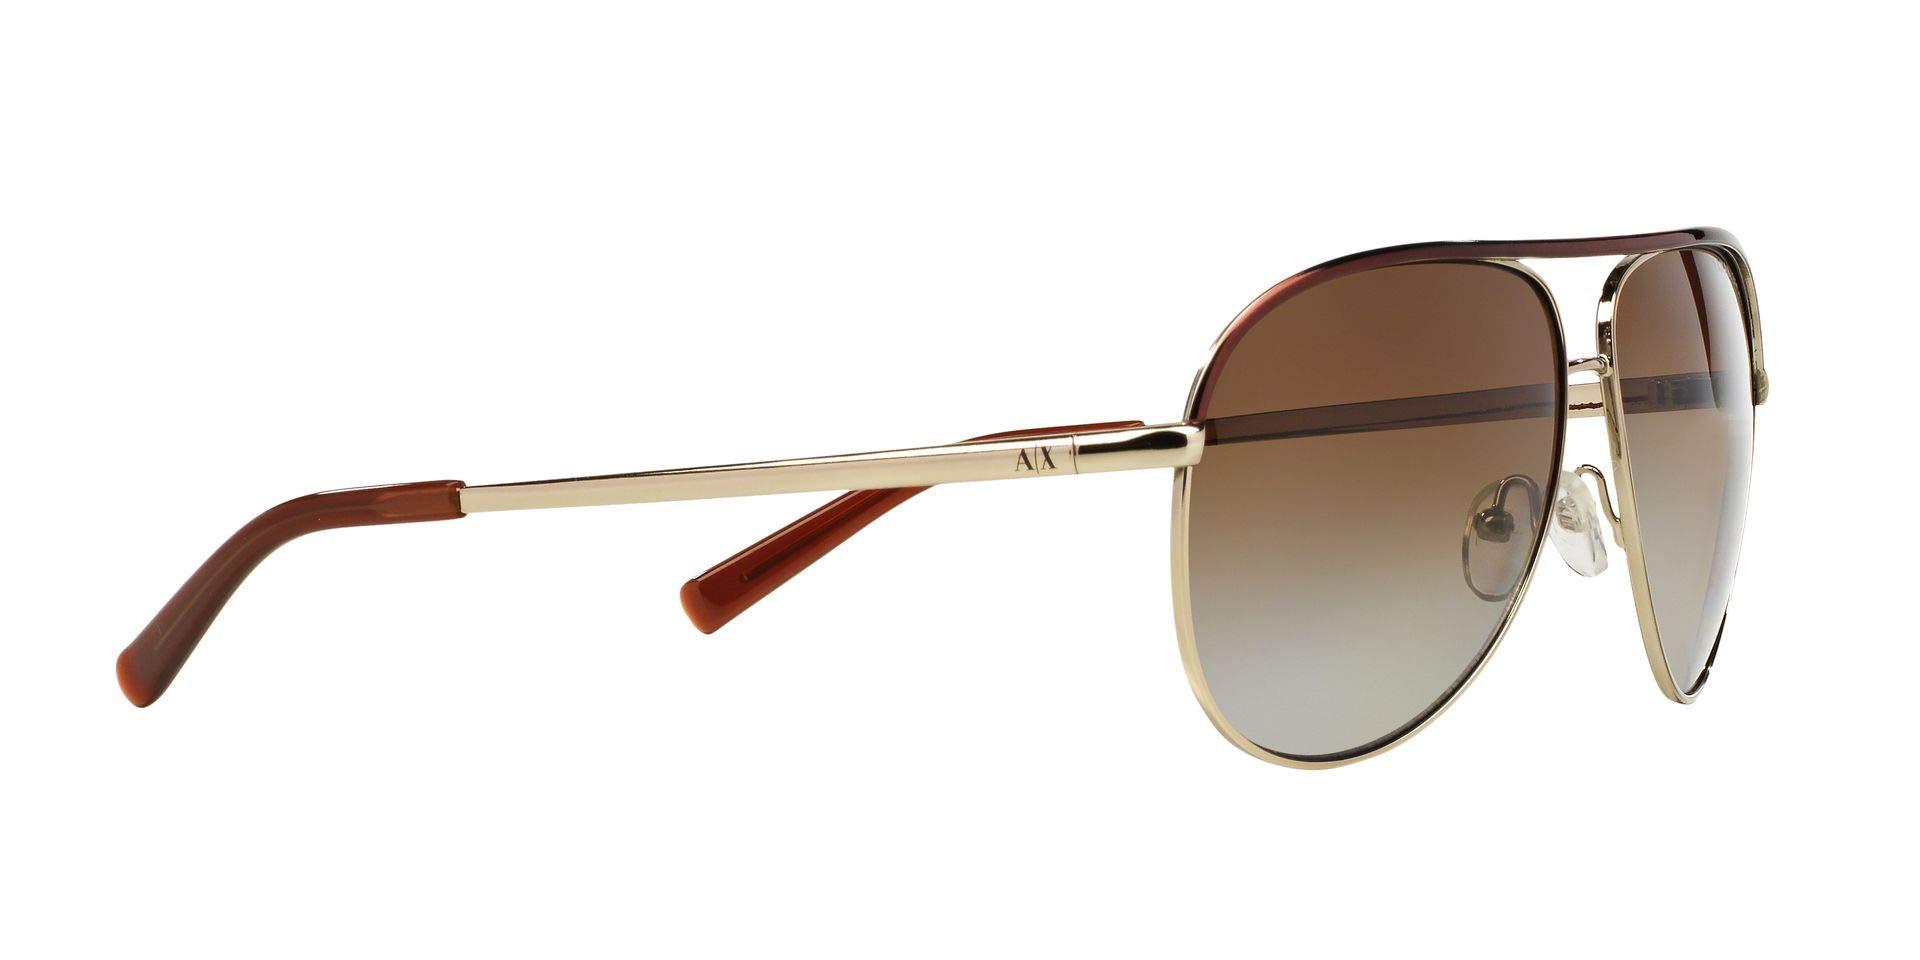 Armani Exchange Metal Unisex Polarized Aviator Sunglasses, Light Gold/Dark Brown, 61 mm by A|X Armani Exchange (Image #12)